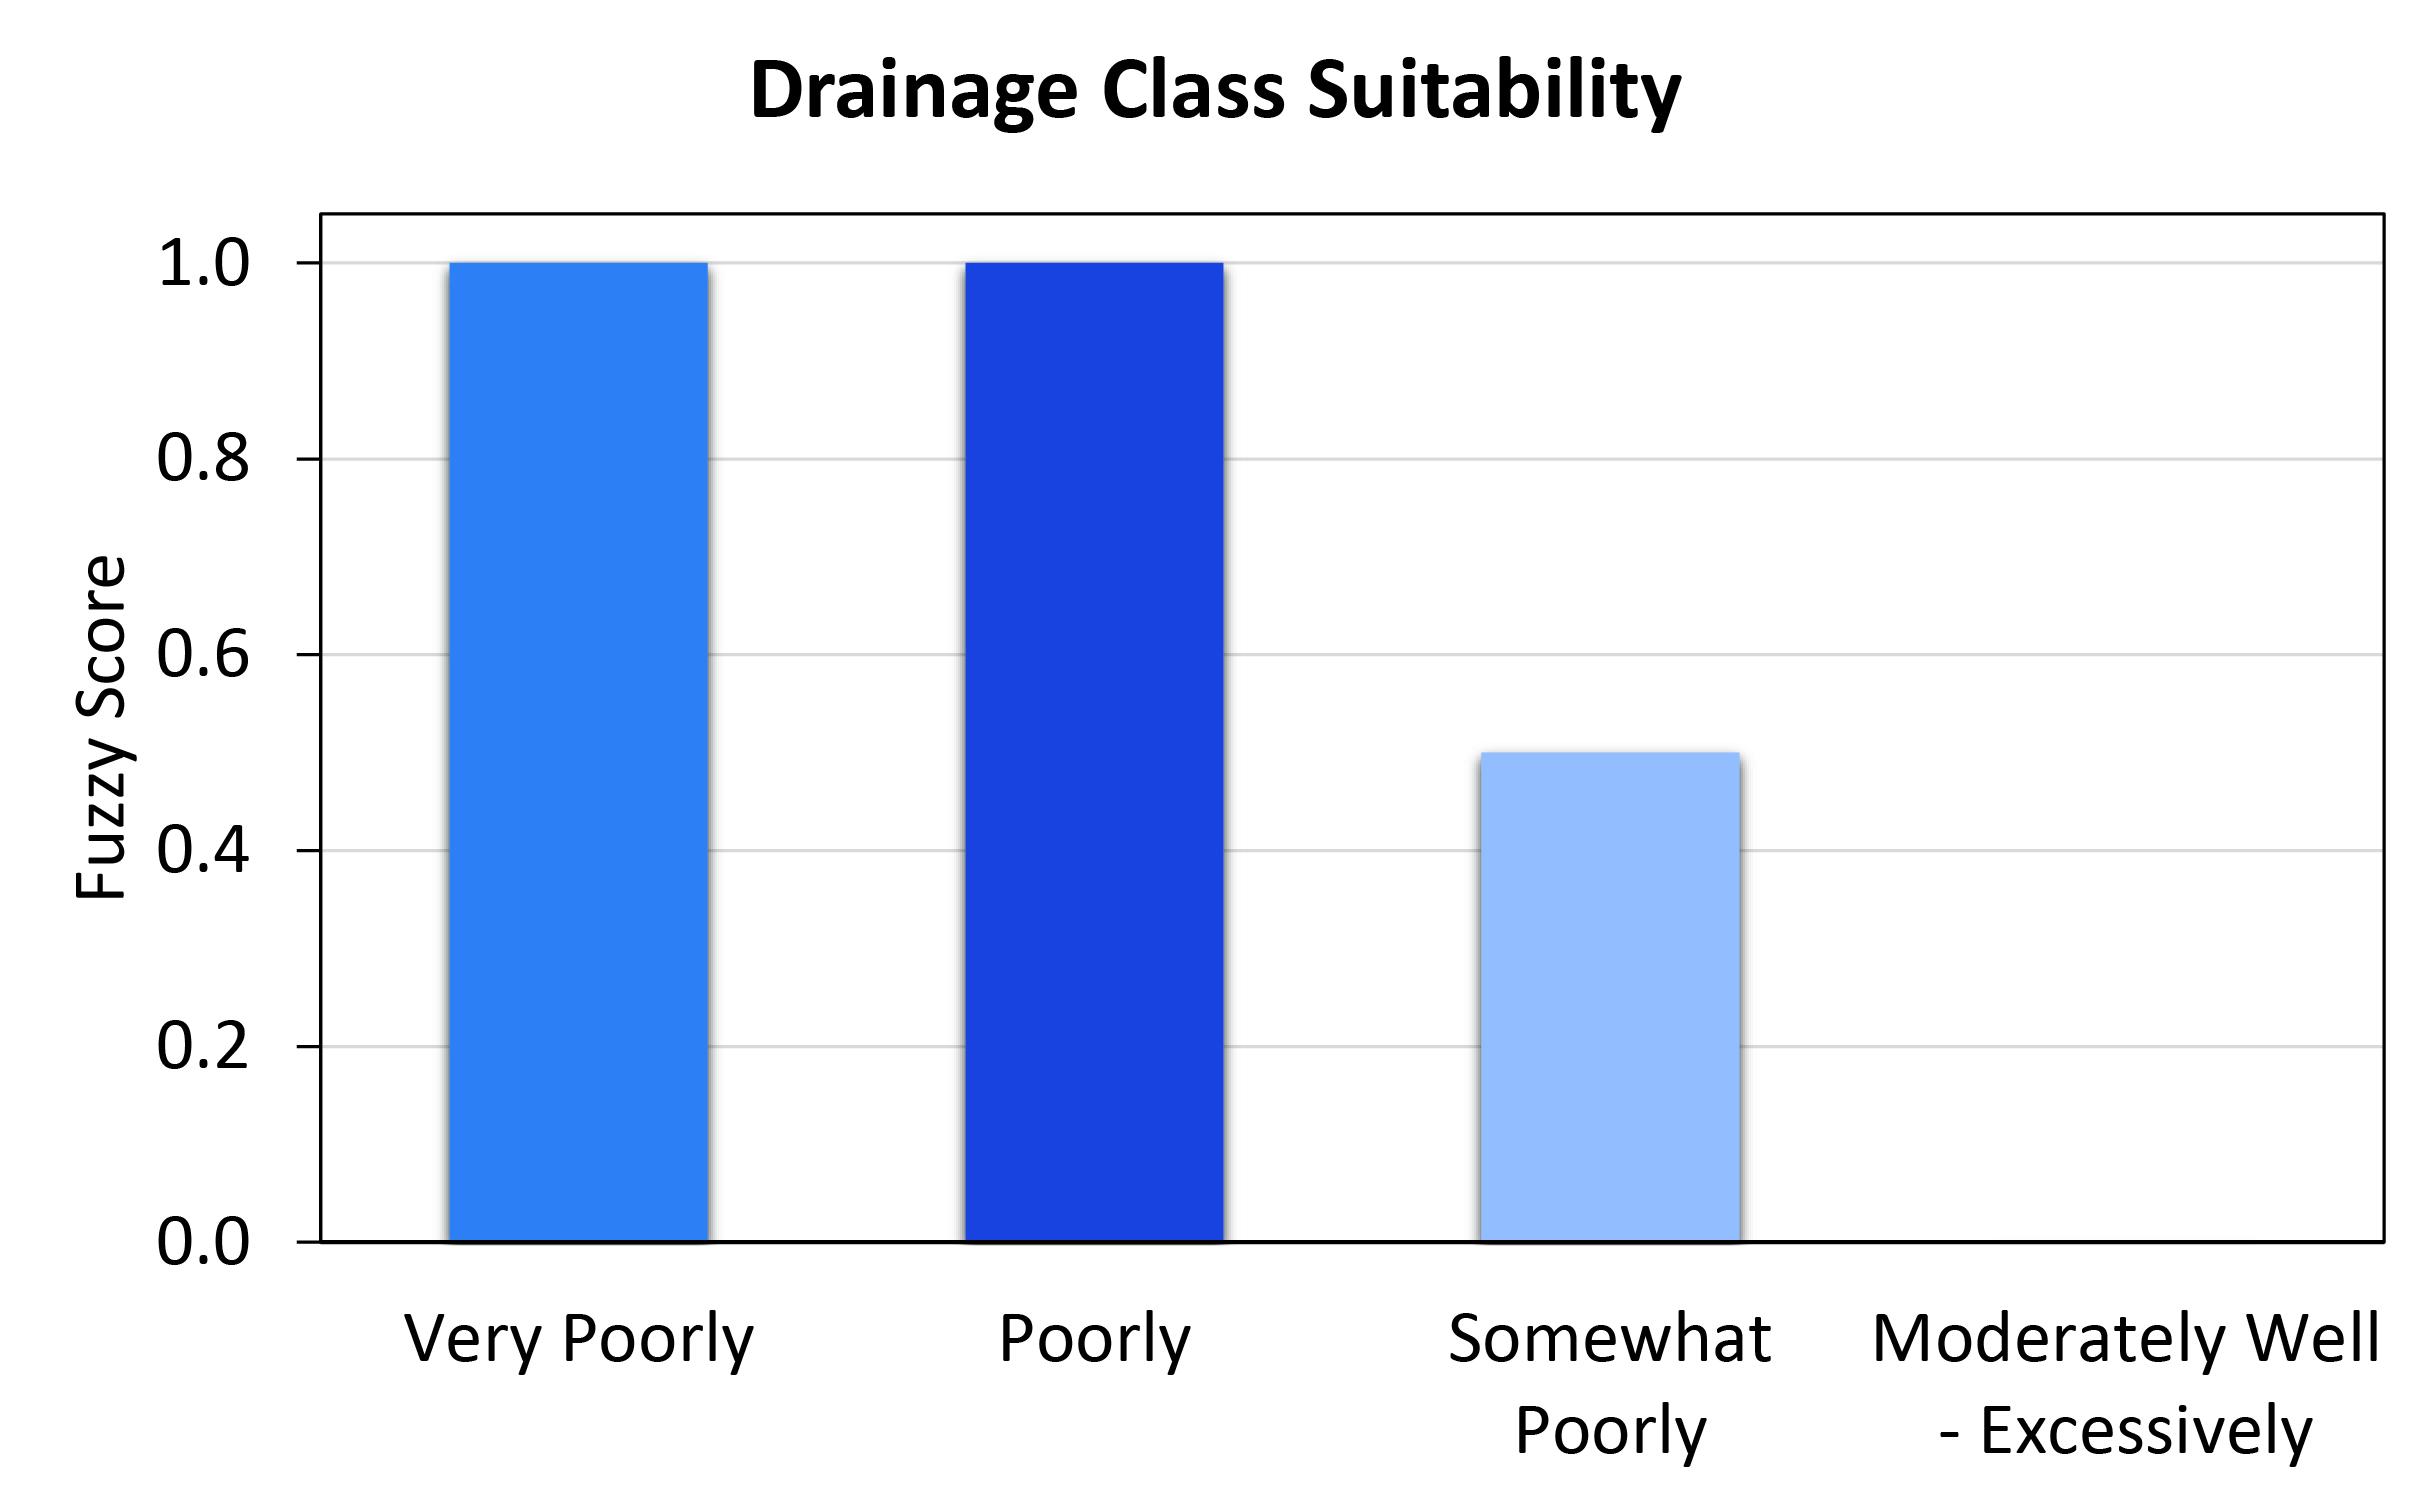 drainage_class